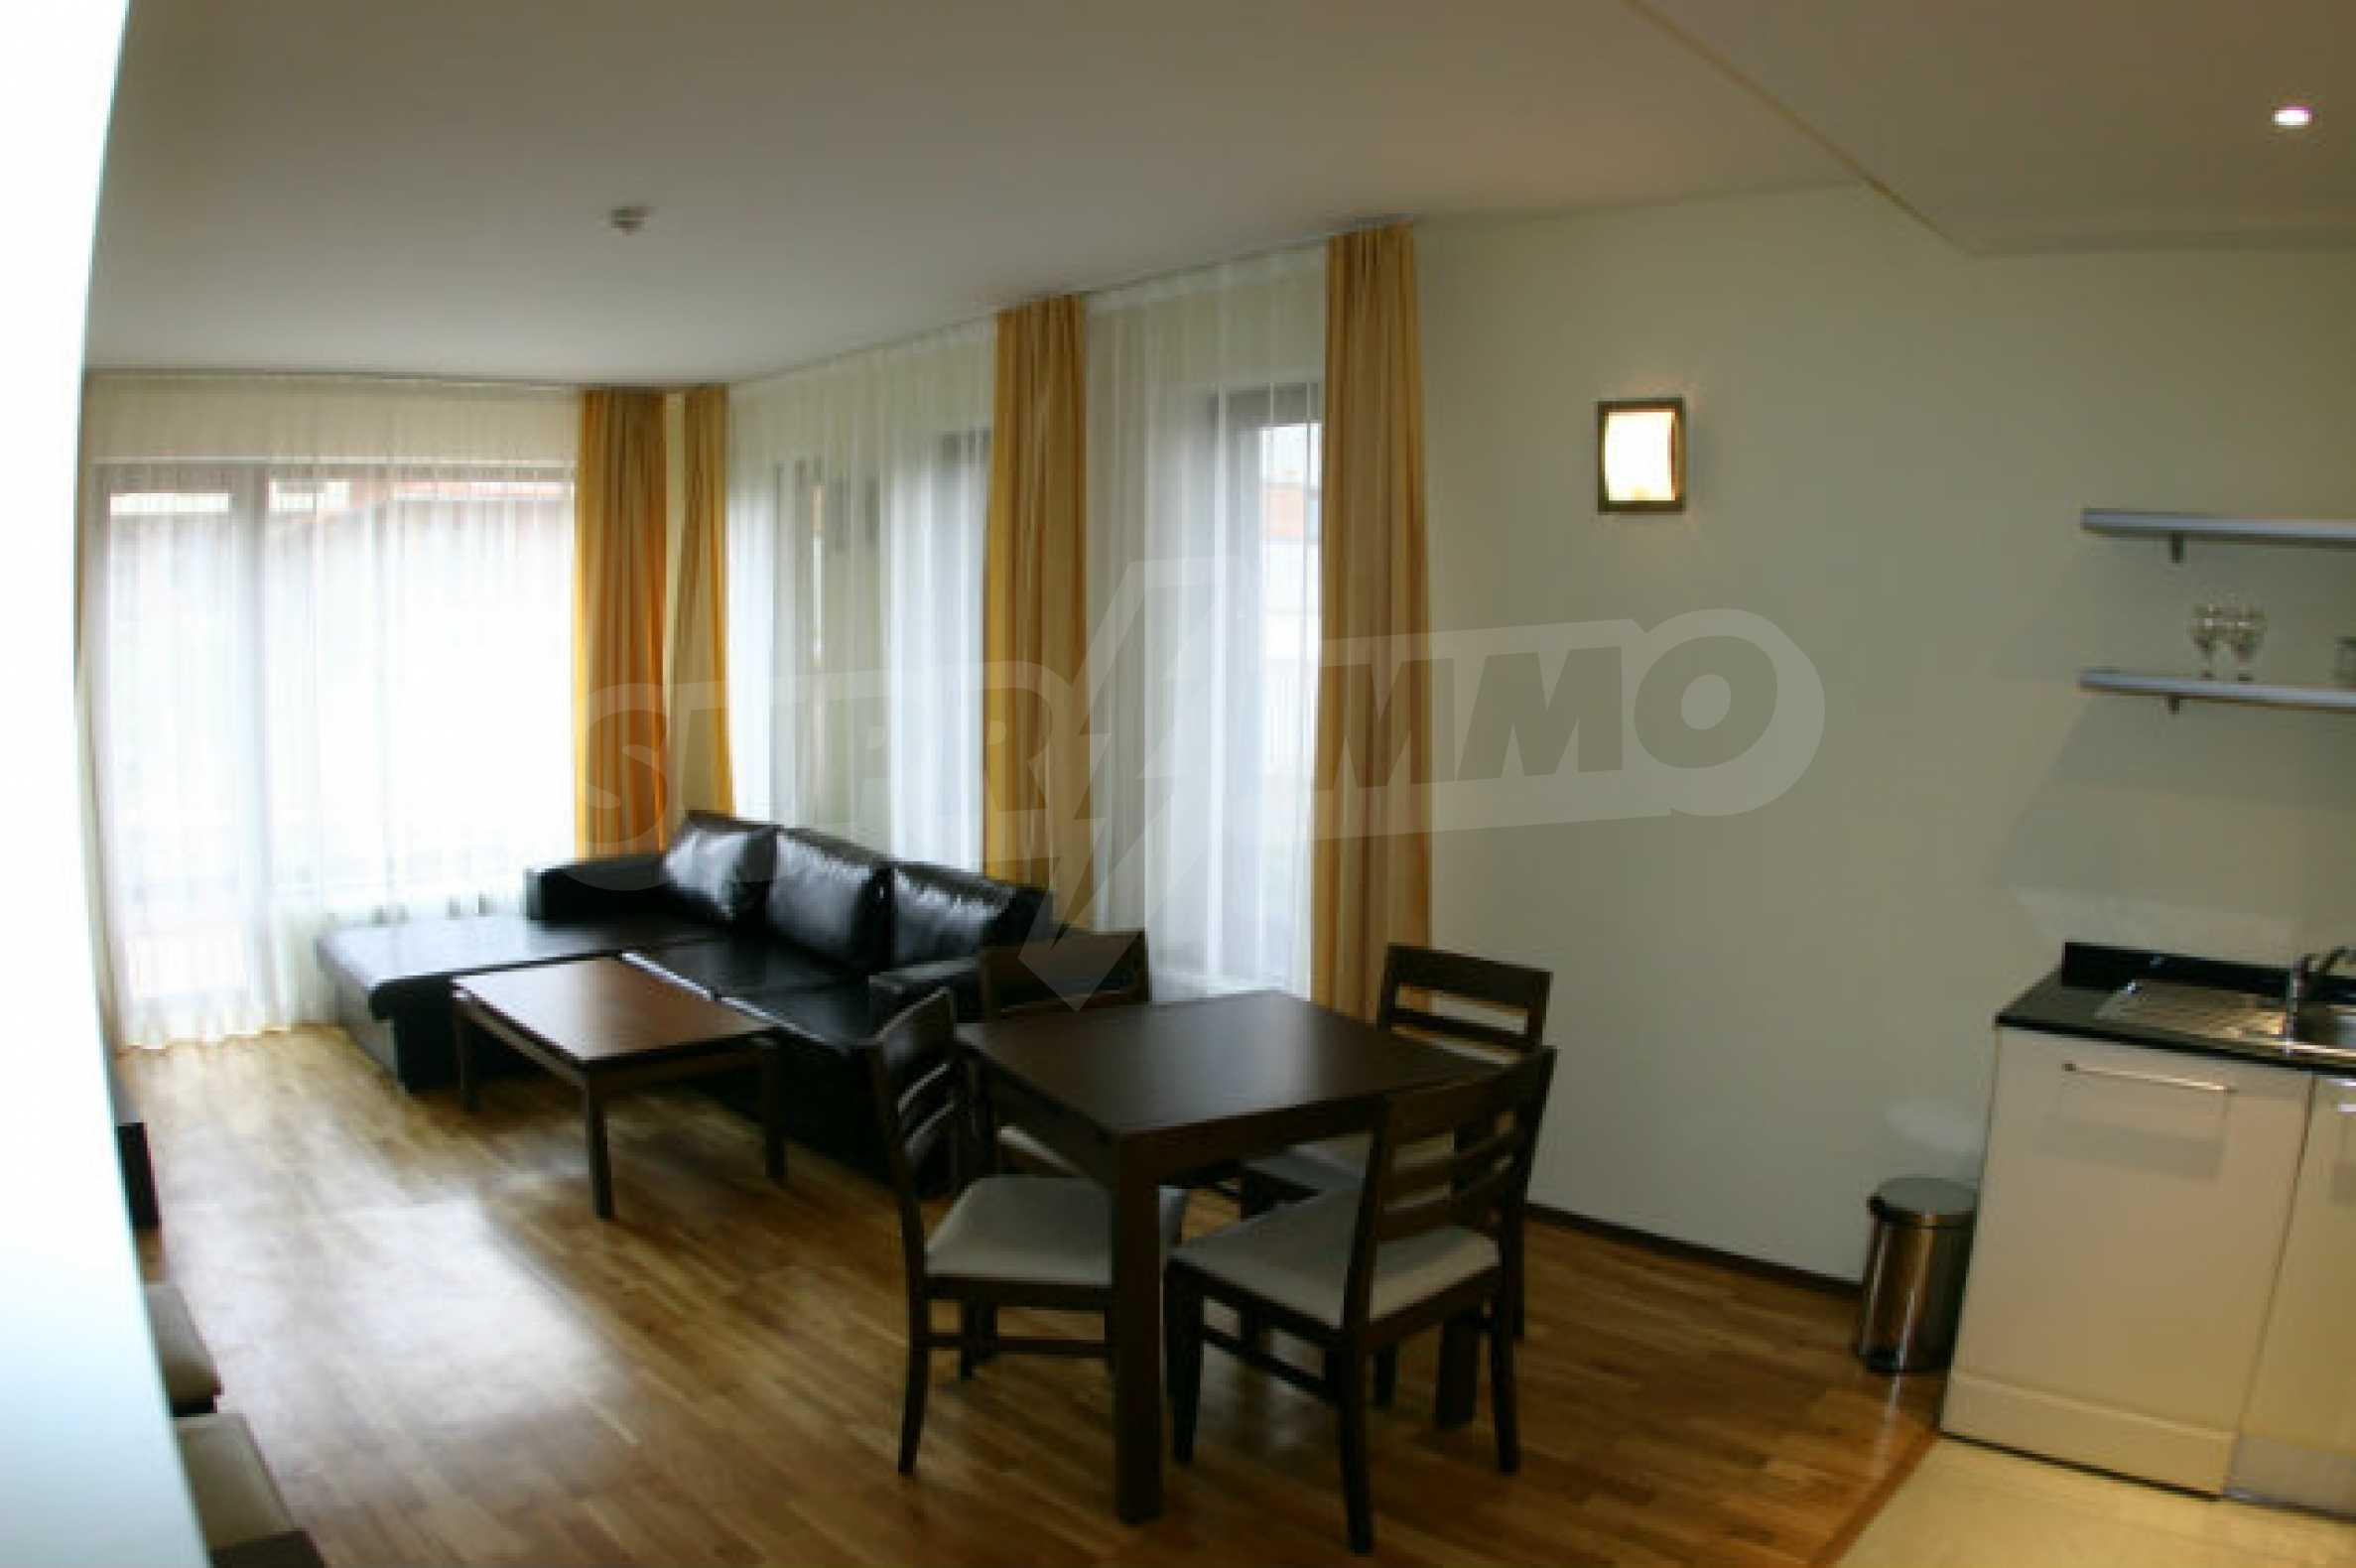 Апартамент в «Мурите Клуб Хотел» (White Fir Valley) 3